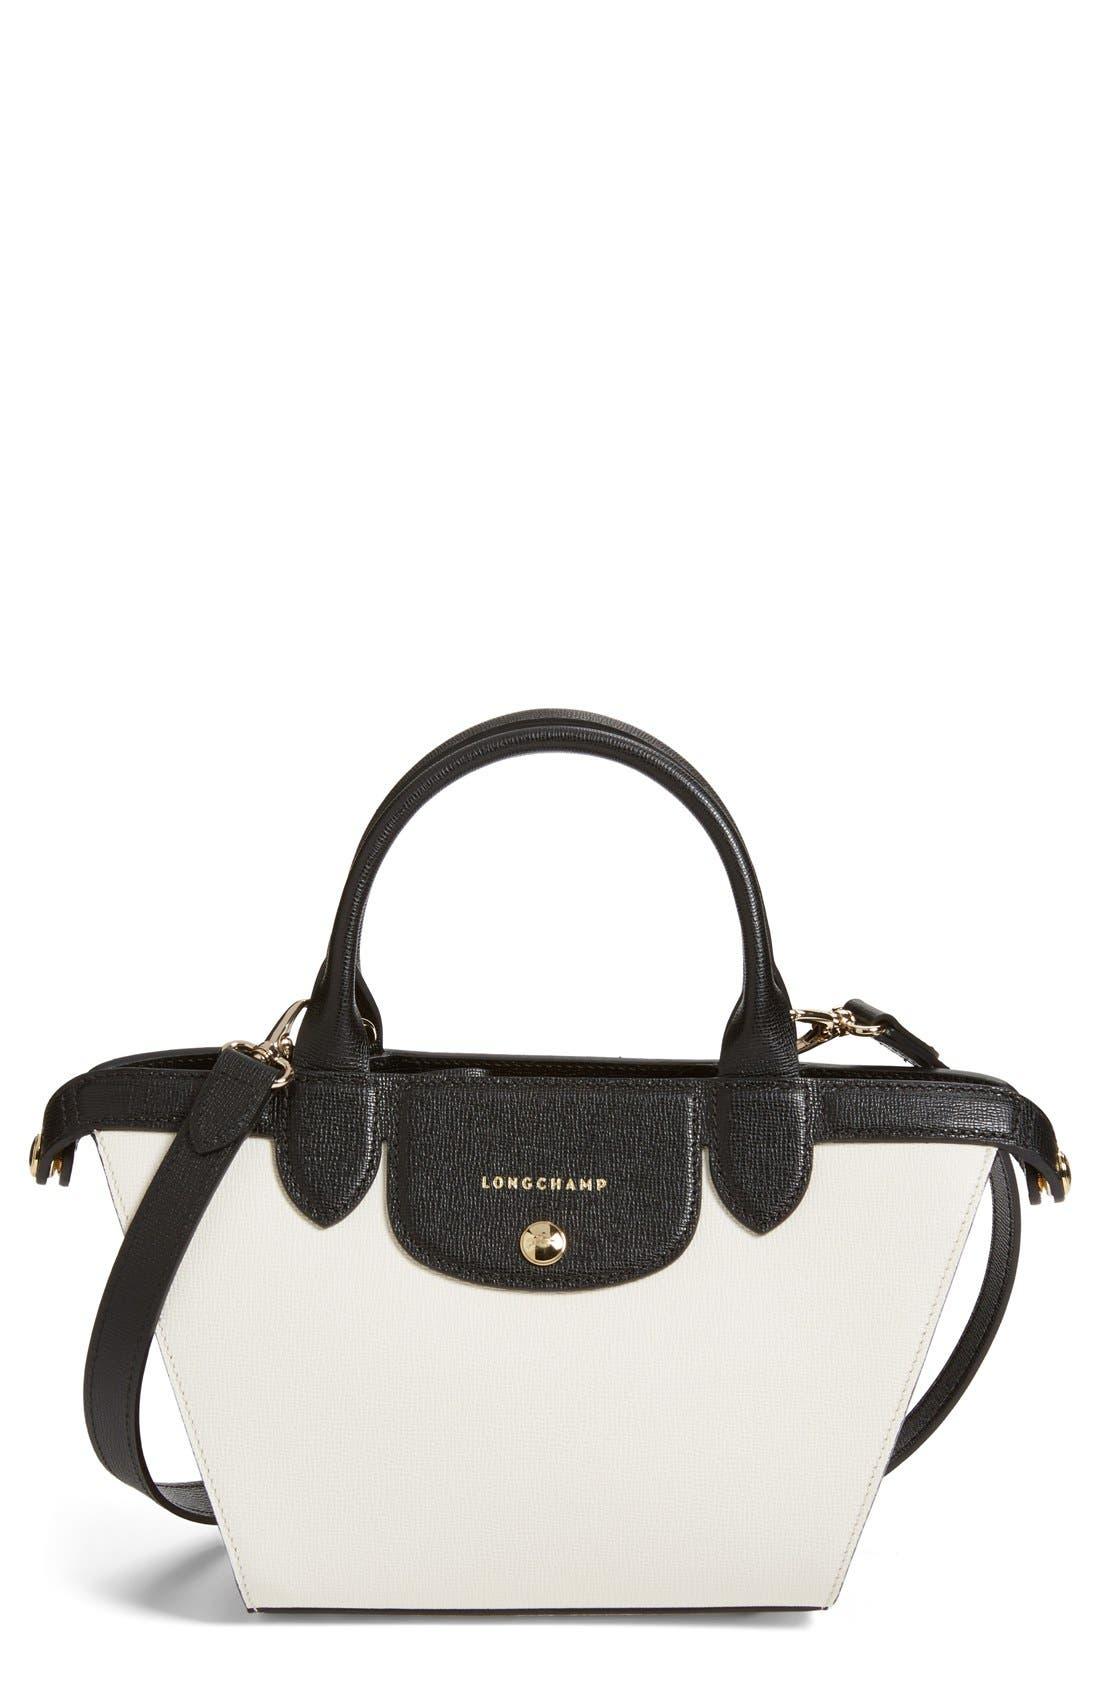 LONGCHAMP, 'Small Le Pliage - Heritage' Leather Handbag, Main thumbnail 1, color, 100